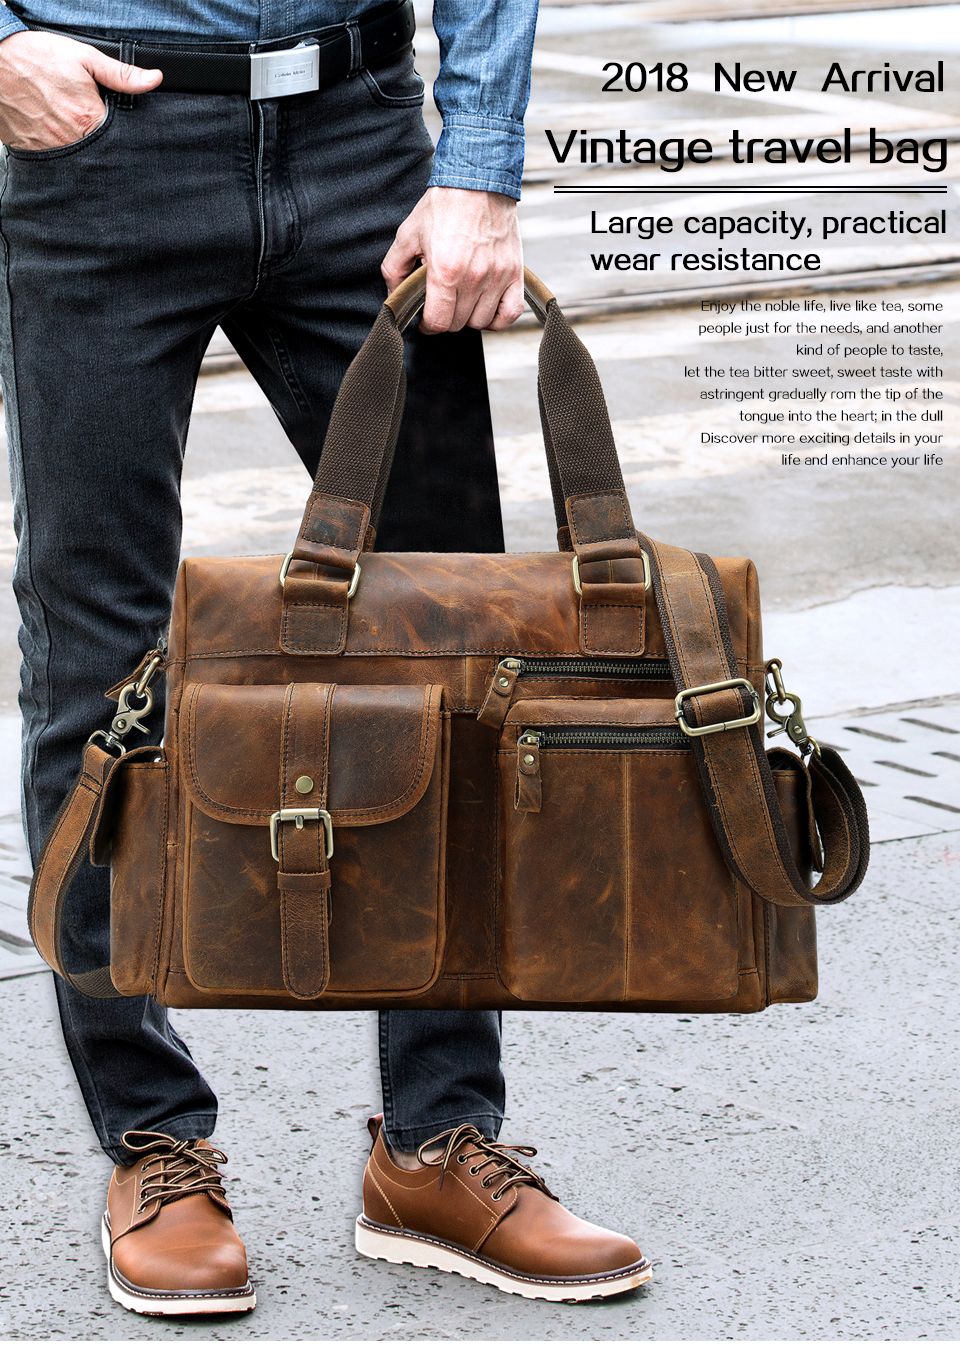 HTB17lrIahrvK1RjSszeq6yObFXab WESTAL men's briefcase leather laptop bag men shoulder bag male briefcases handbags office bags for men business porte document